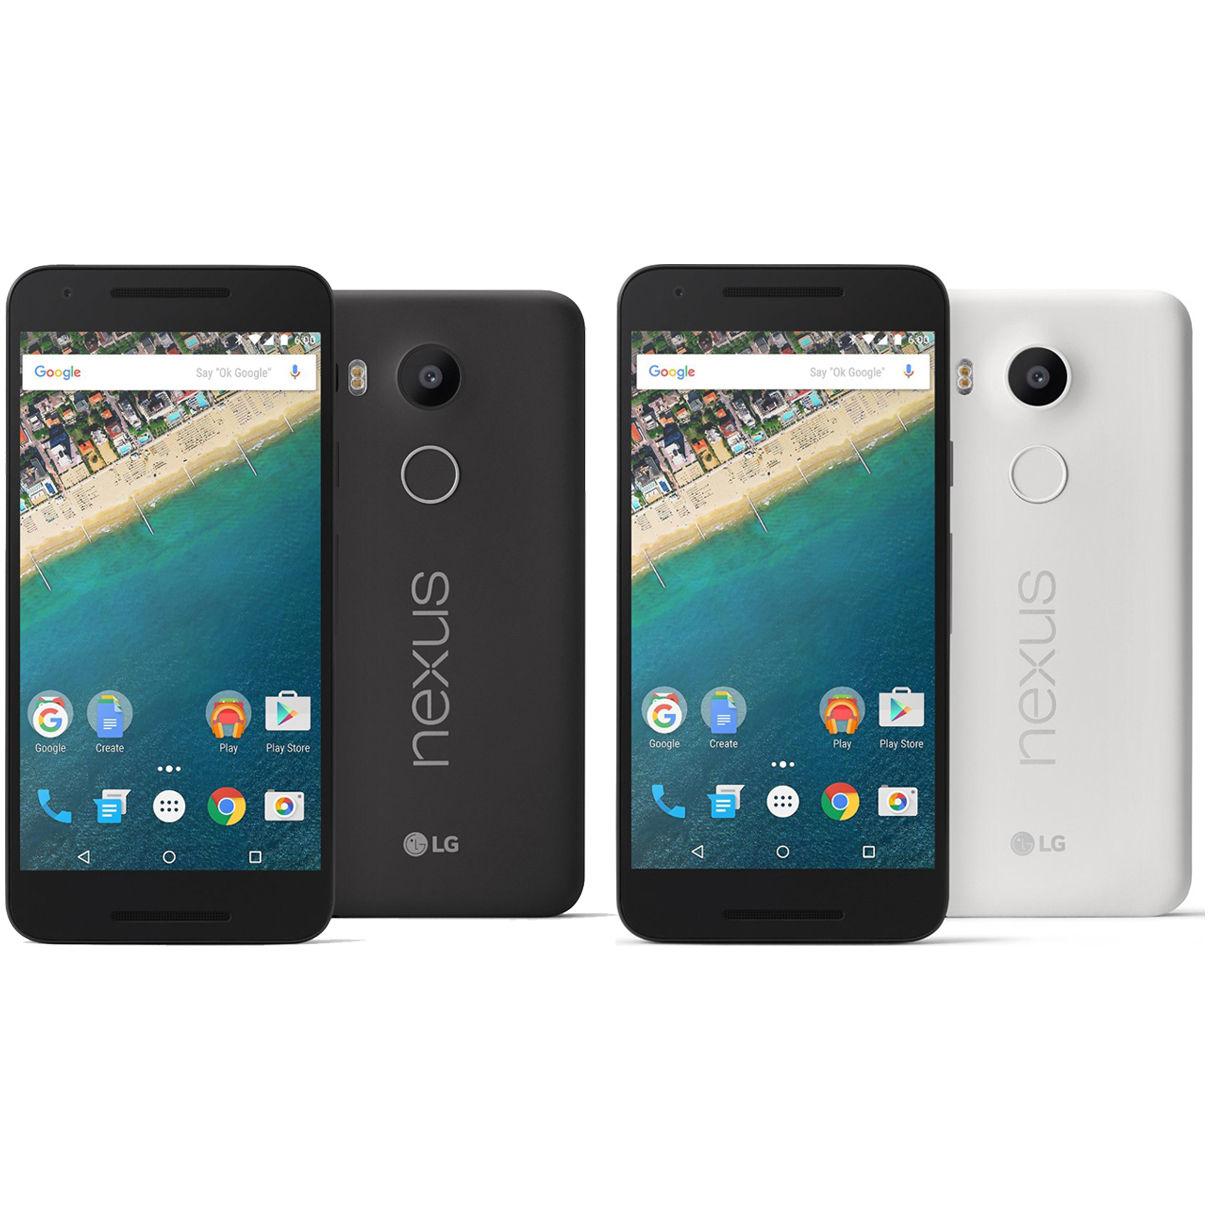 LG Nexus 5X H790 Unlocked Smartphone: 32GB $330, 16GB  $280 + Free Shipping